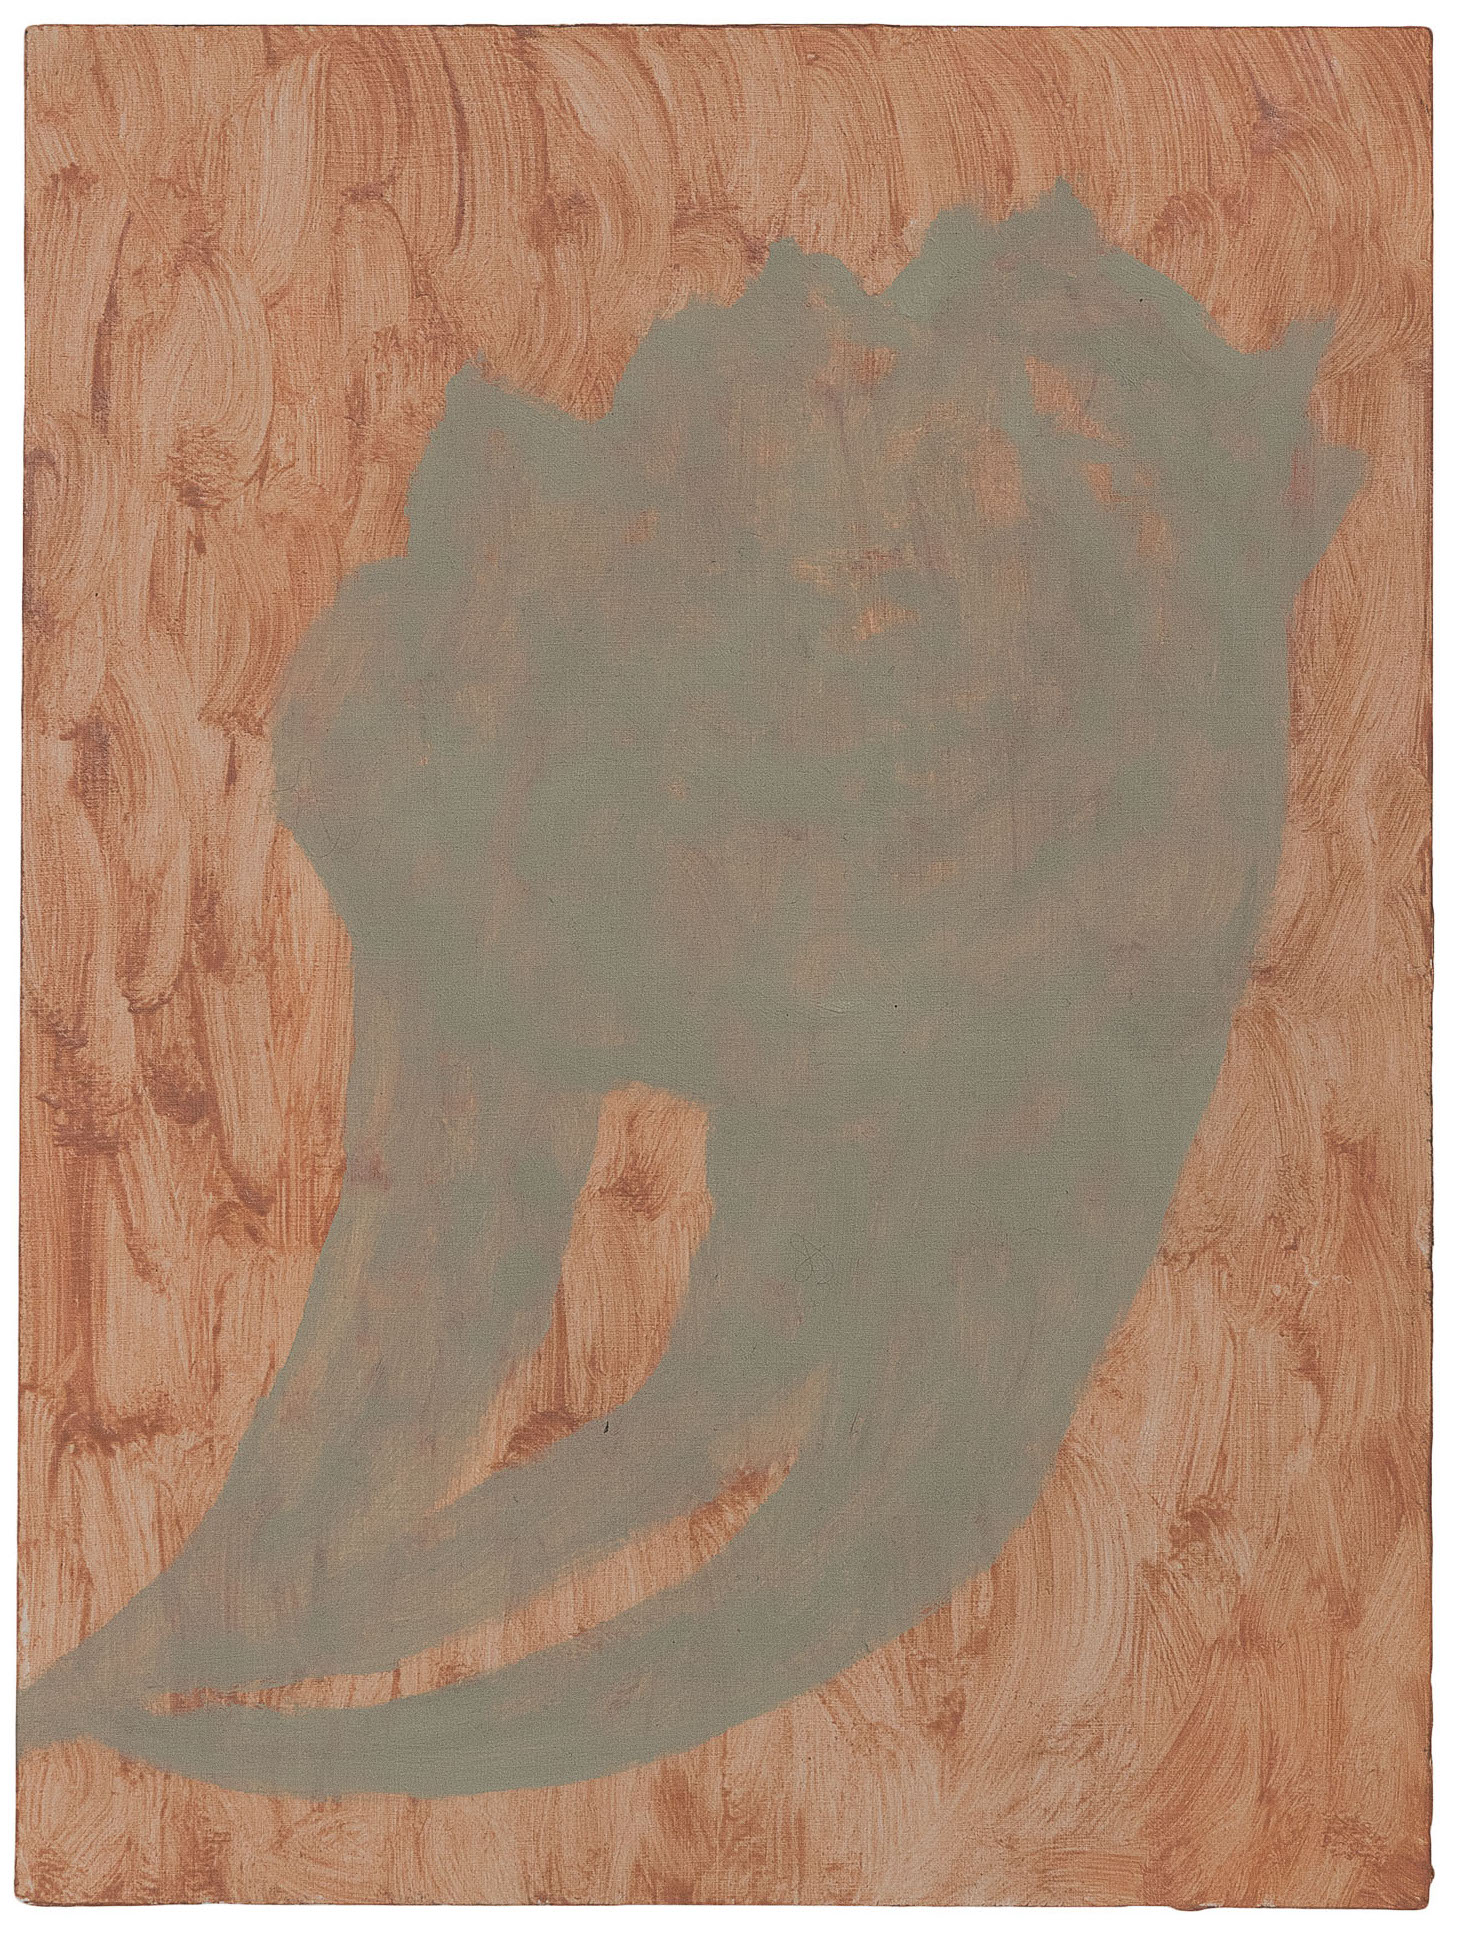 Veronika Hilger, untitled, oil on paper on wood, 2018, 40 x 30 cm